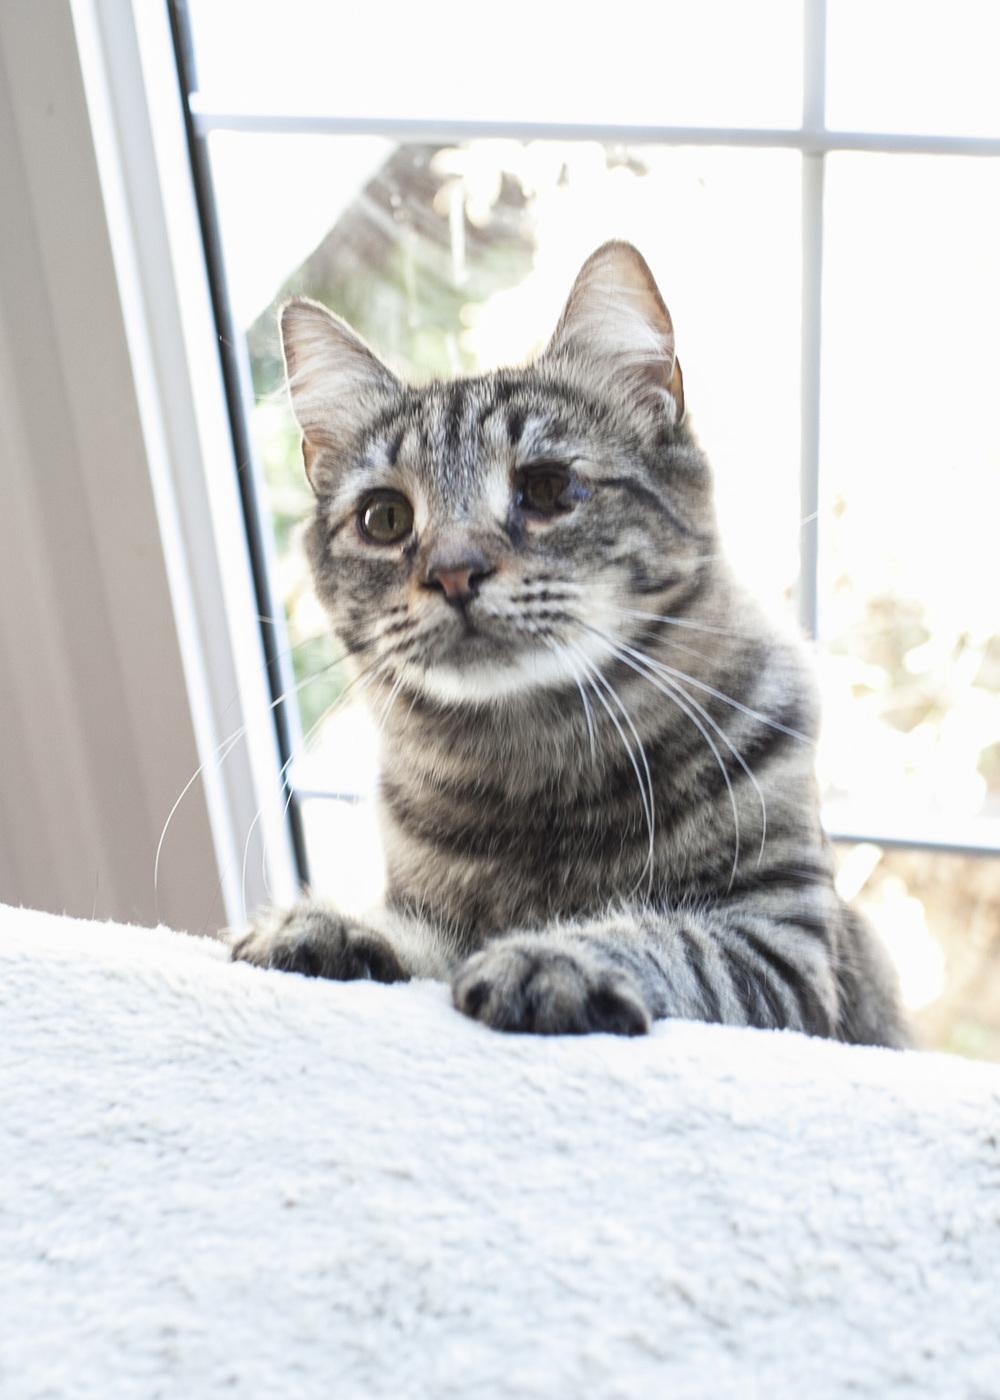 Meow_18.jpg